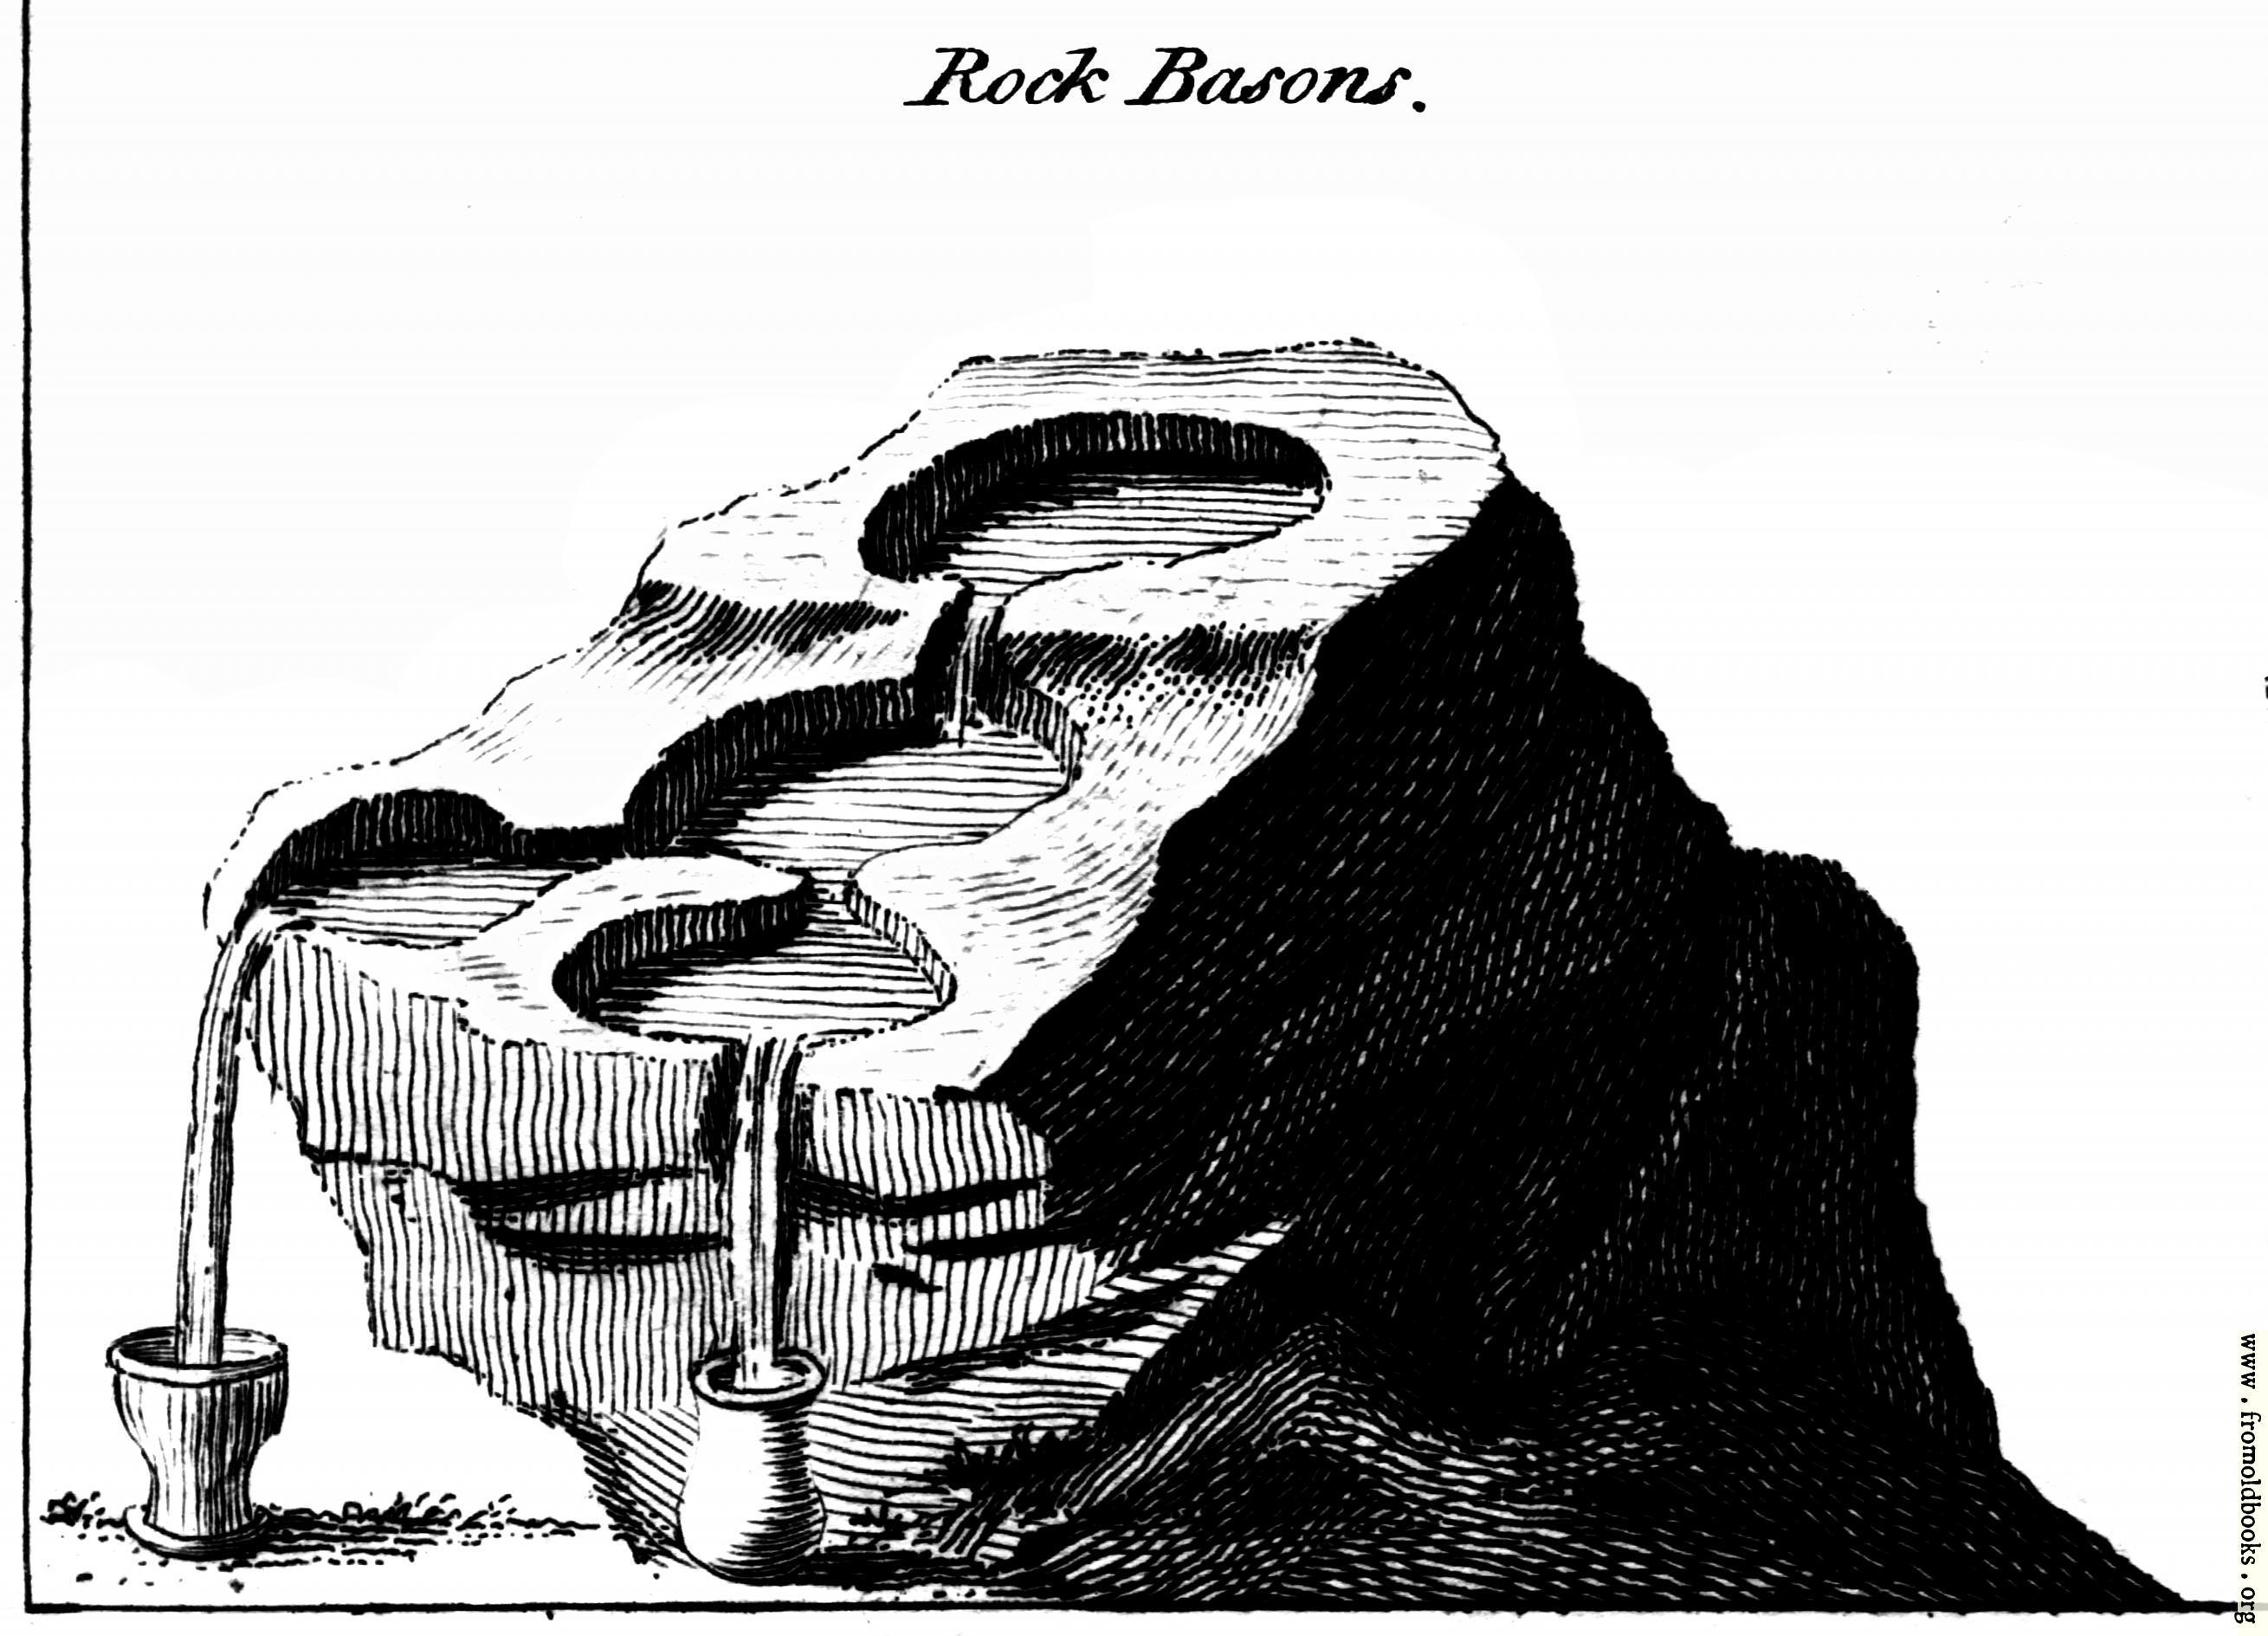 [Picture: Rock basons]